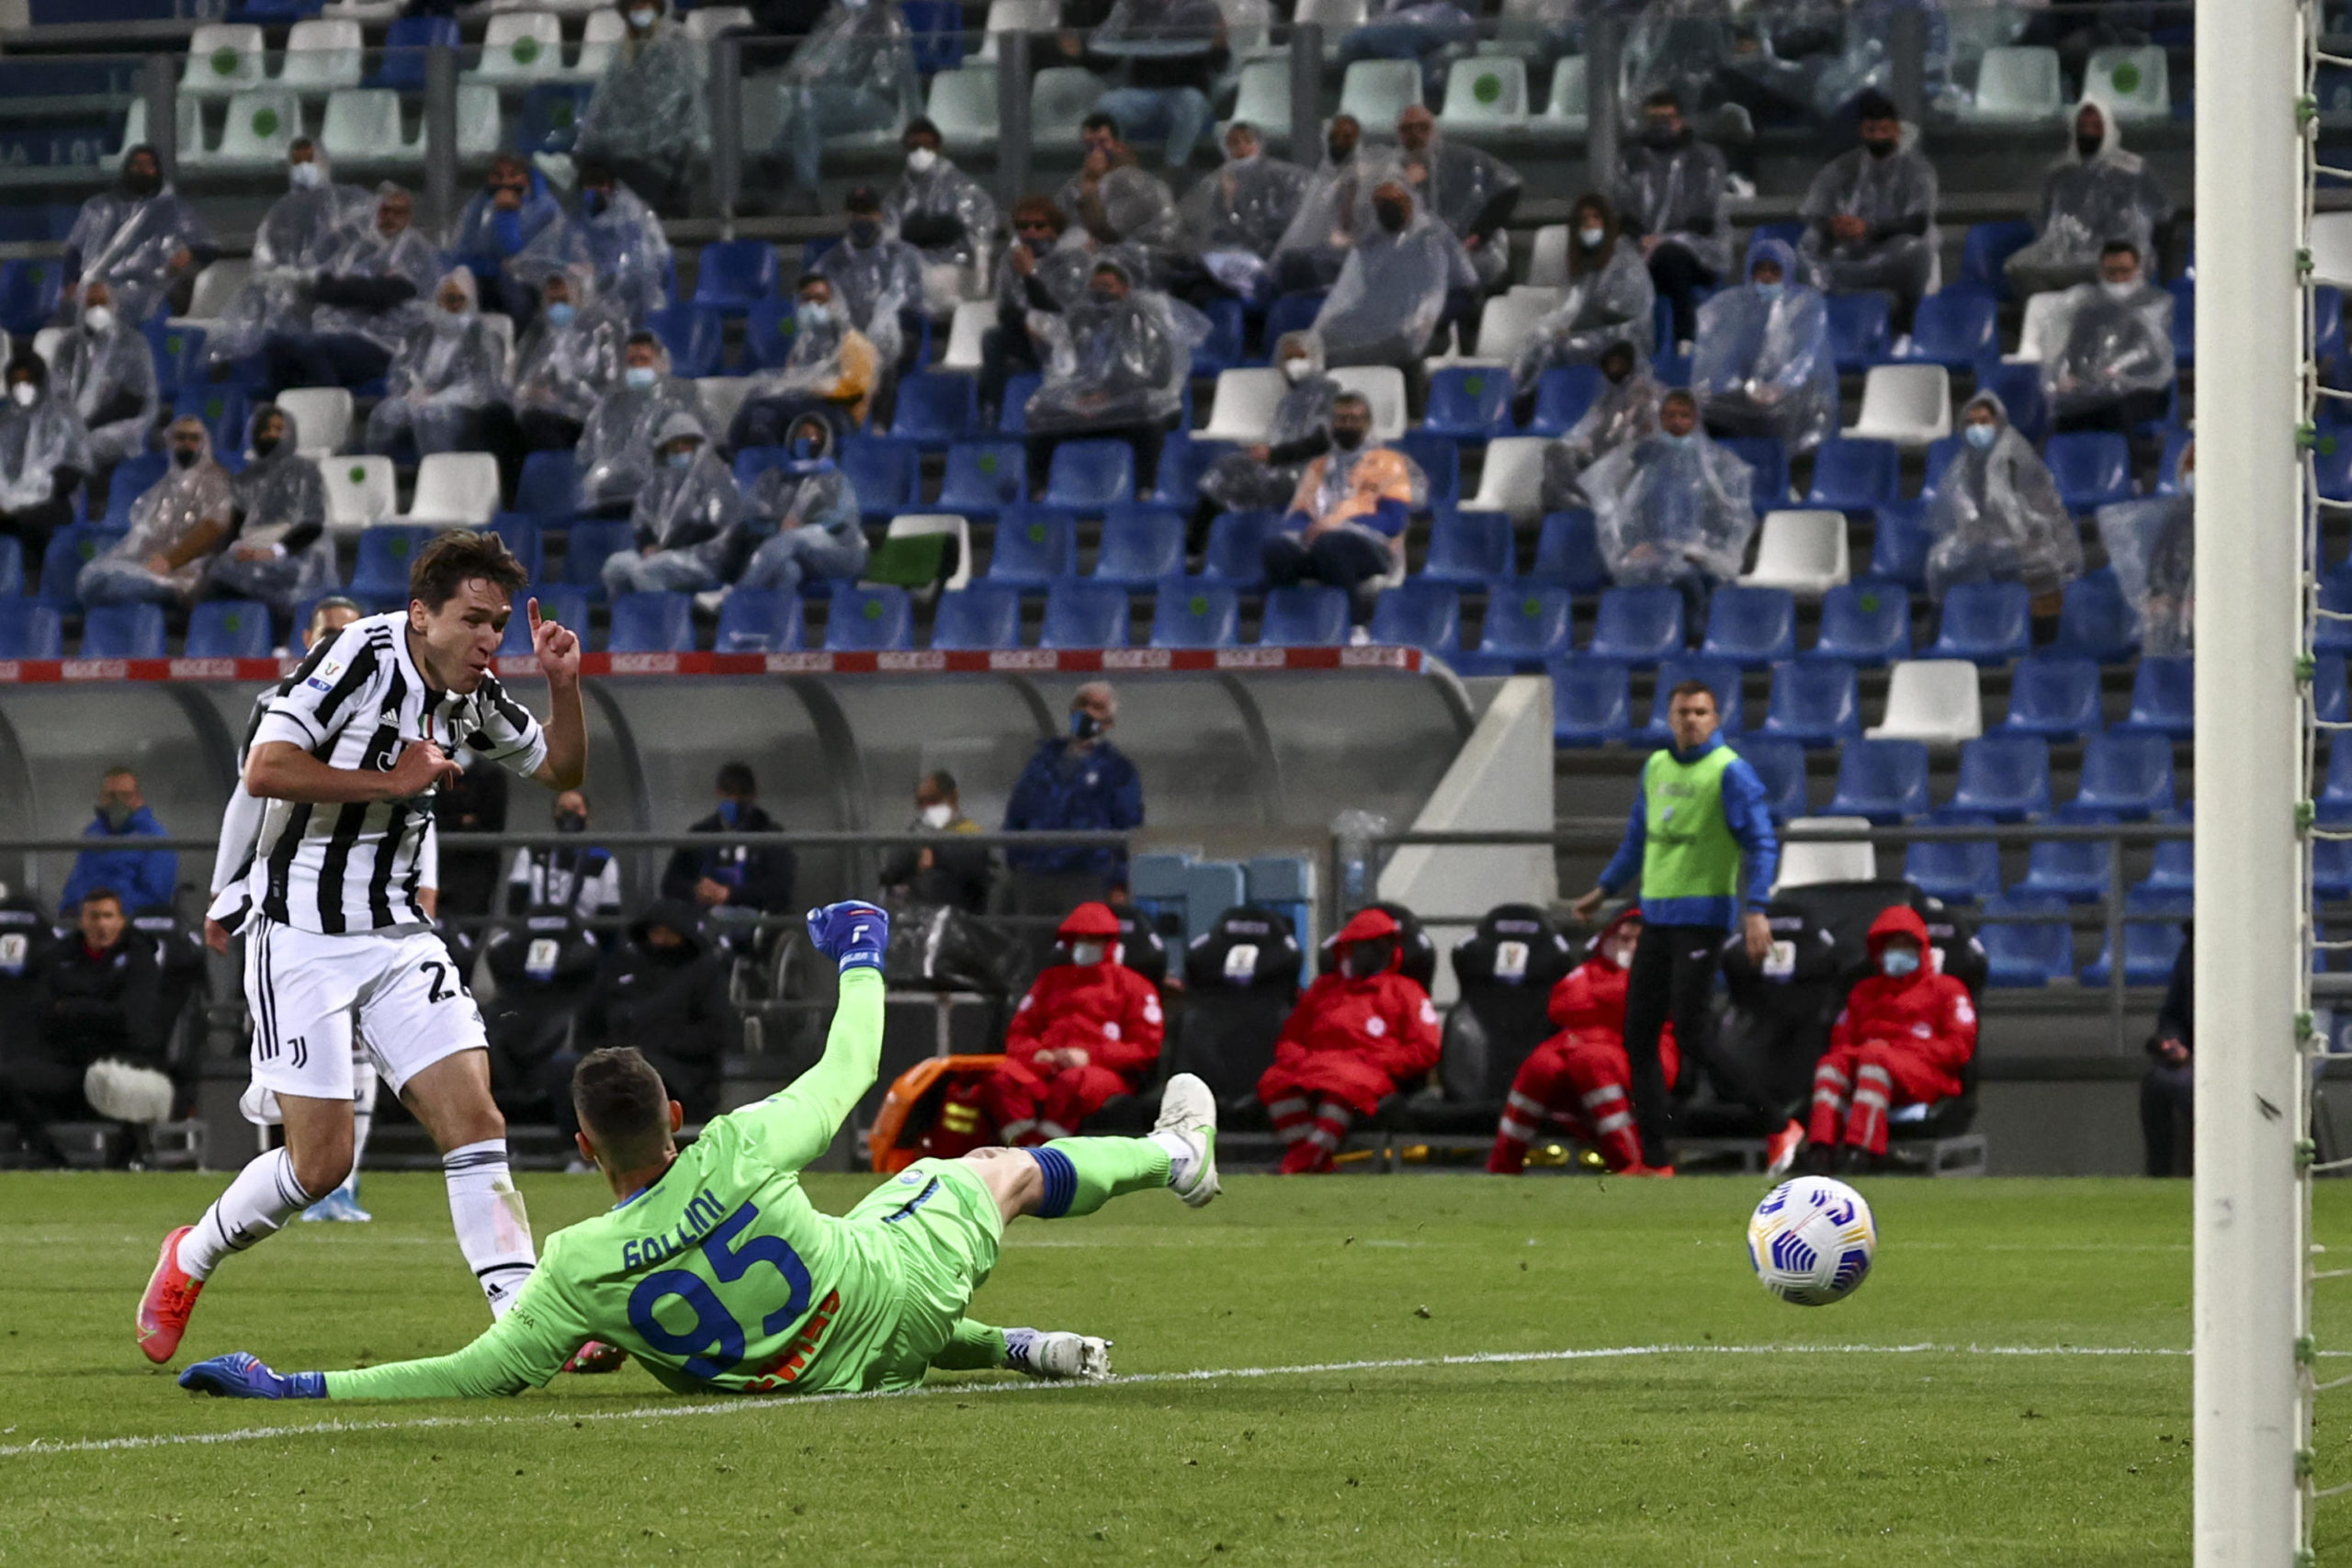 Federico Chiesa scores against Atalanta in the Coppa Italia final